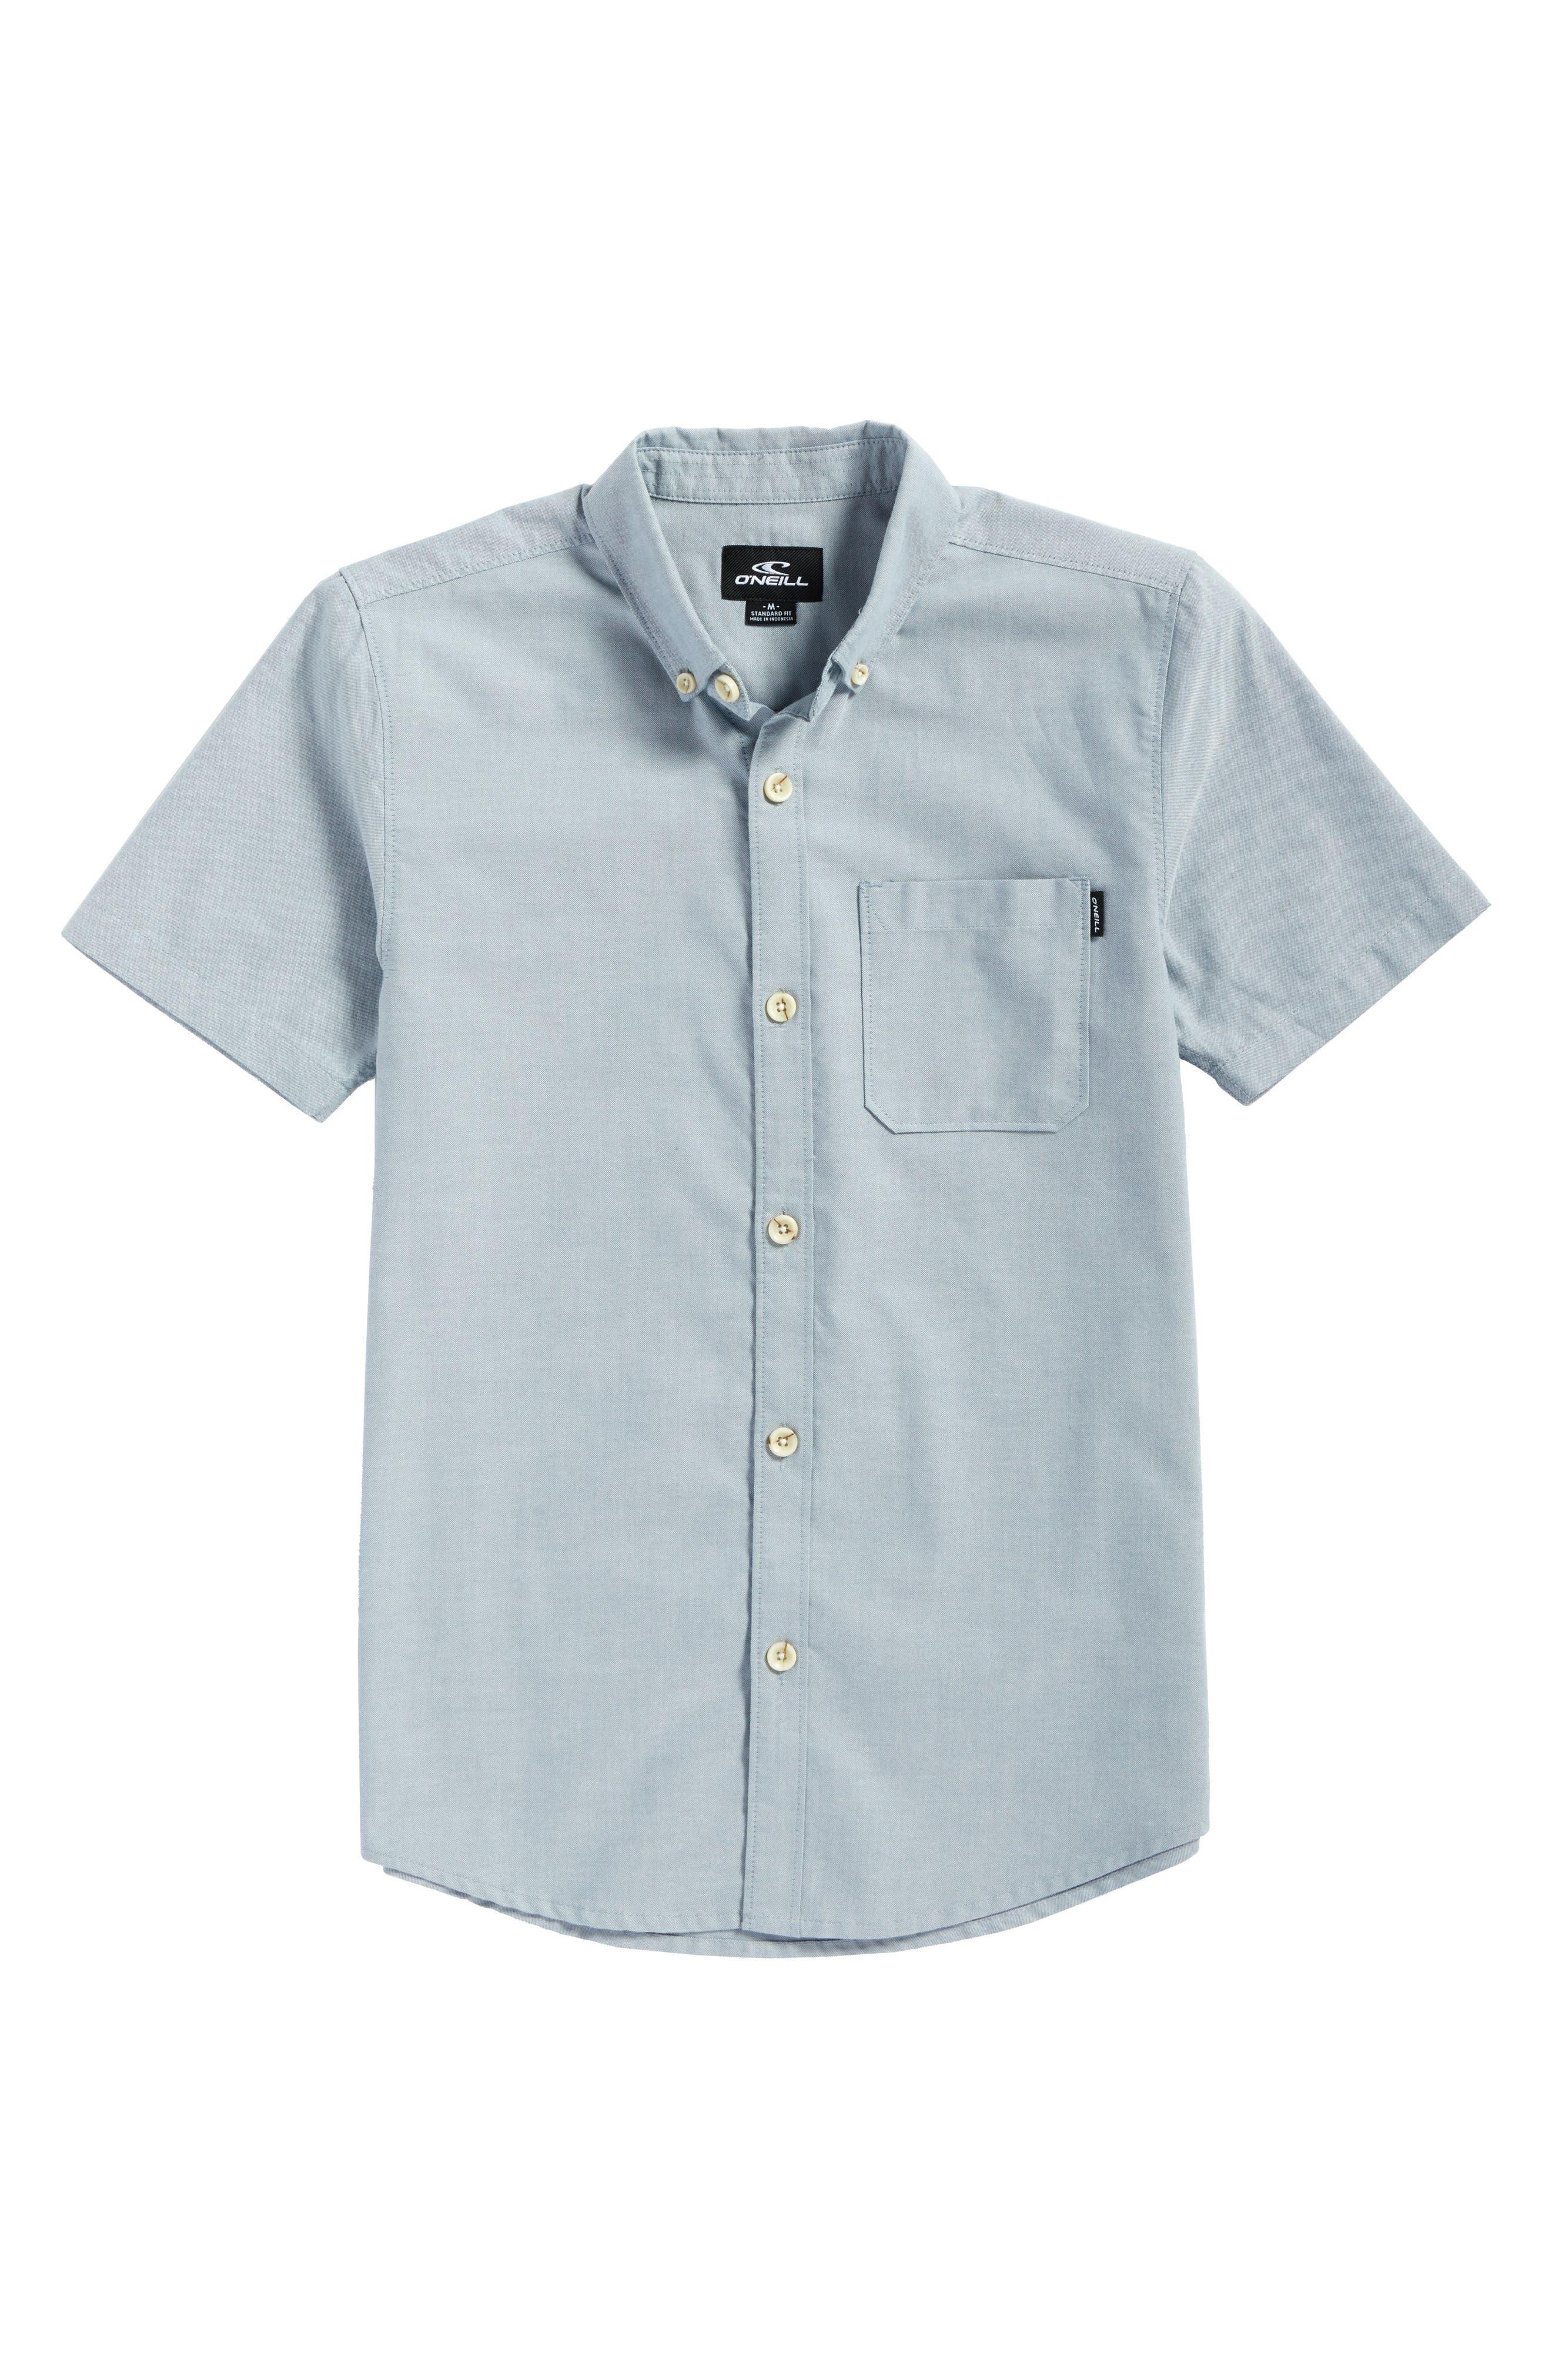 Alternate Image 1 Selected - O'Neill Bank Woven Shirt (Big Boys)